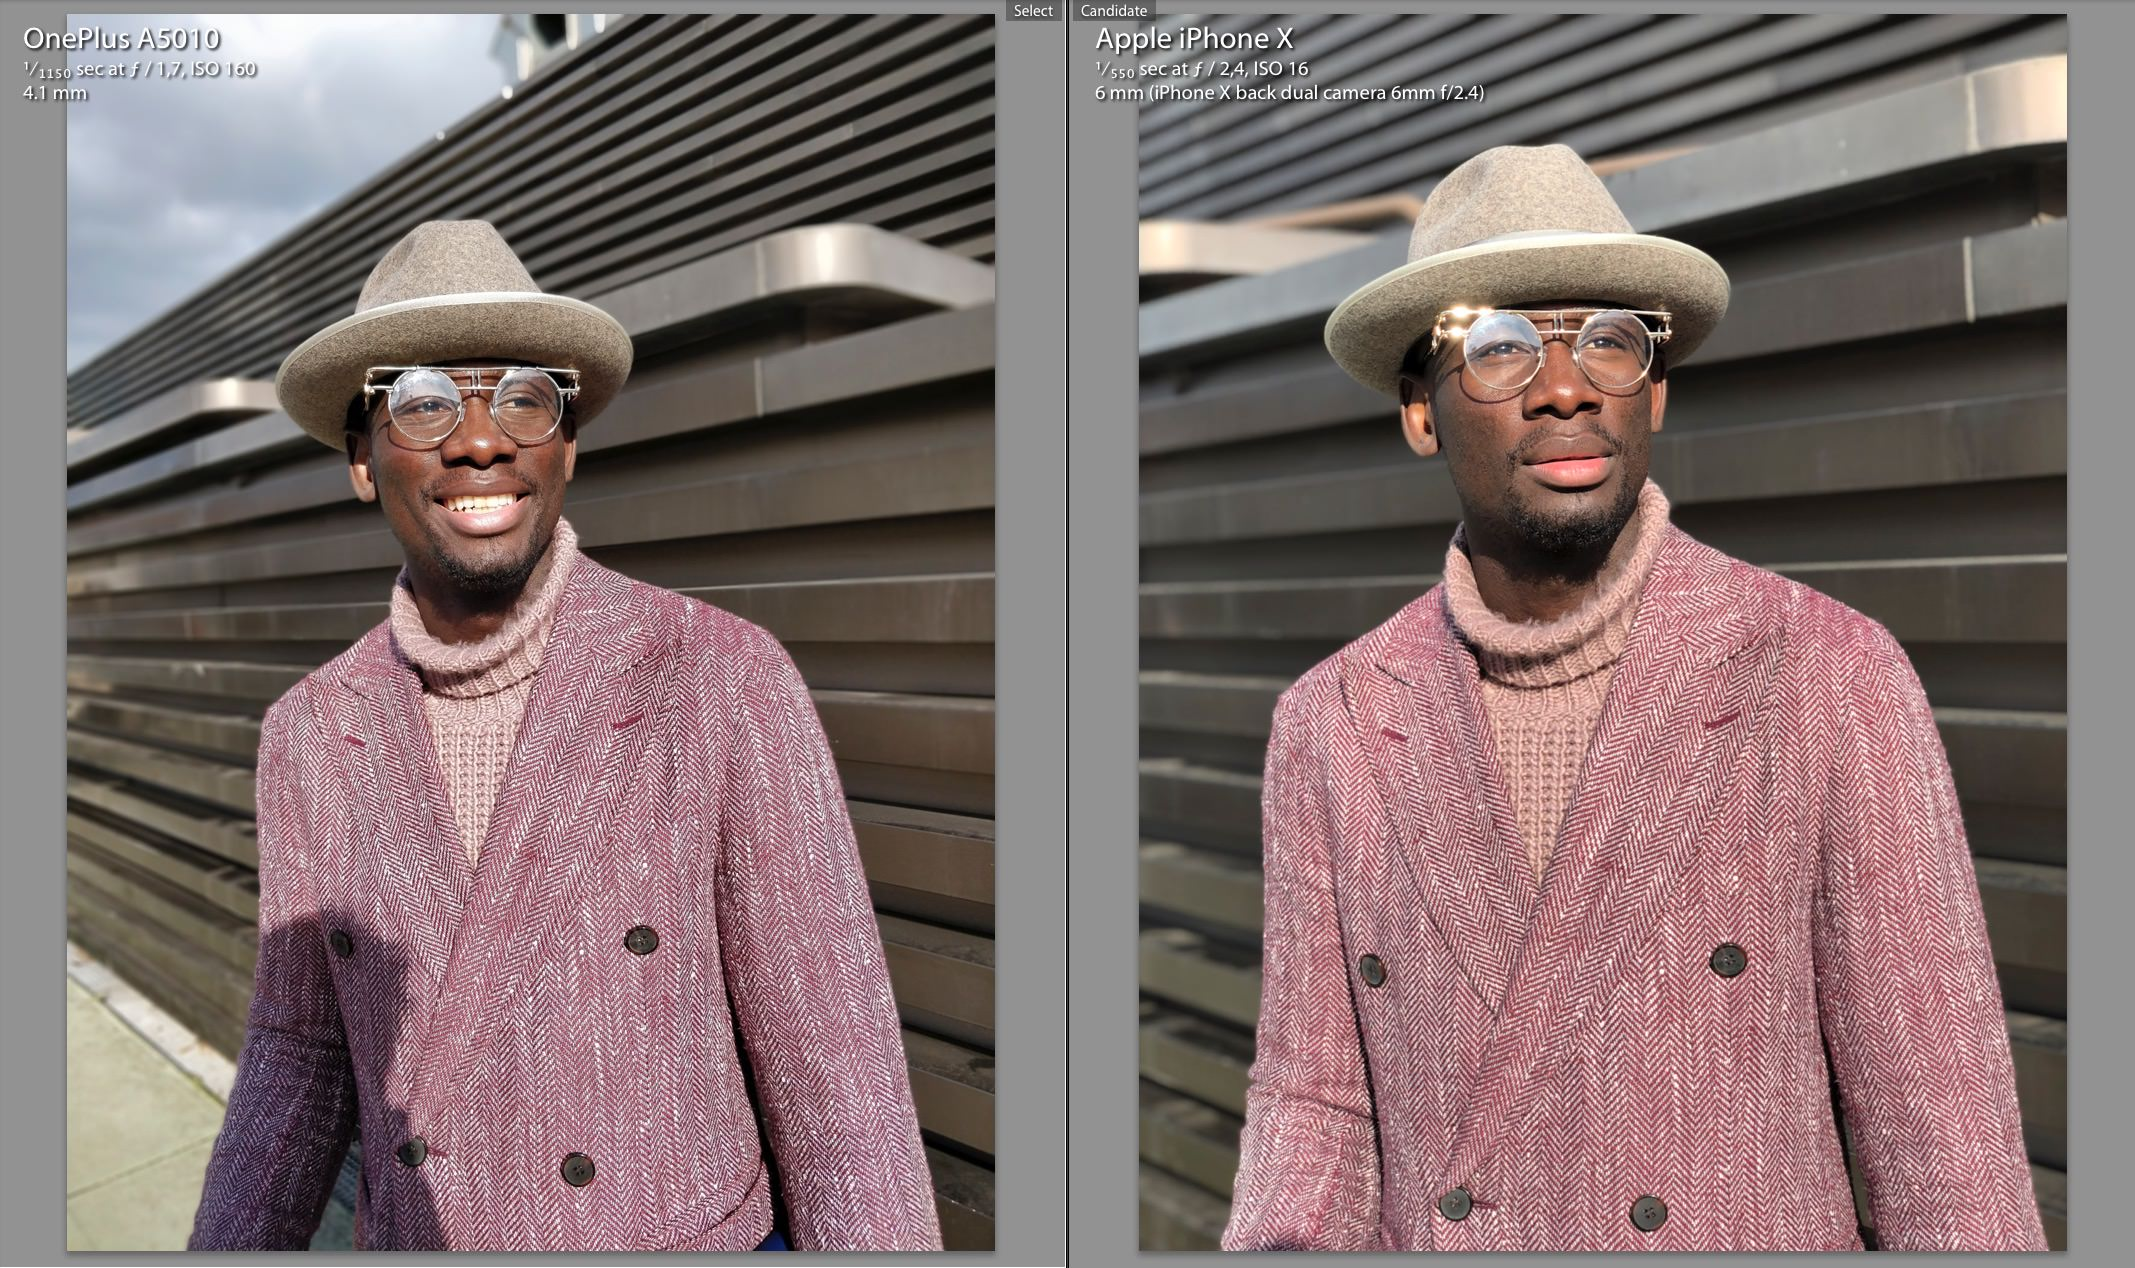 Portrait Mode OnePlus 5t Vs iPhone X